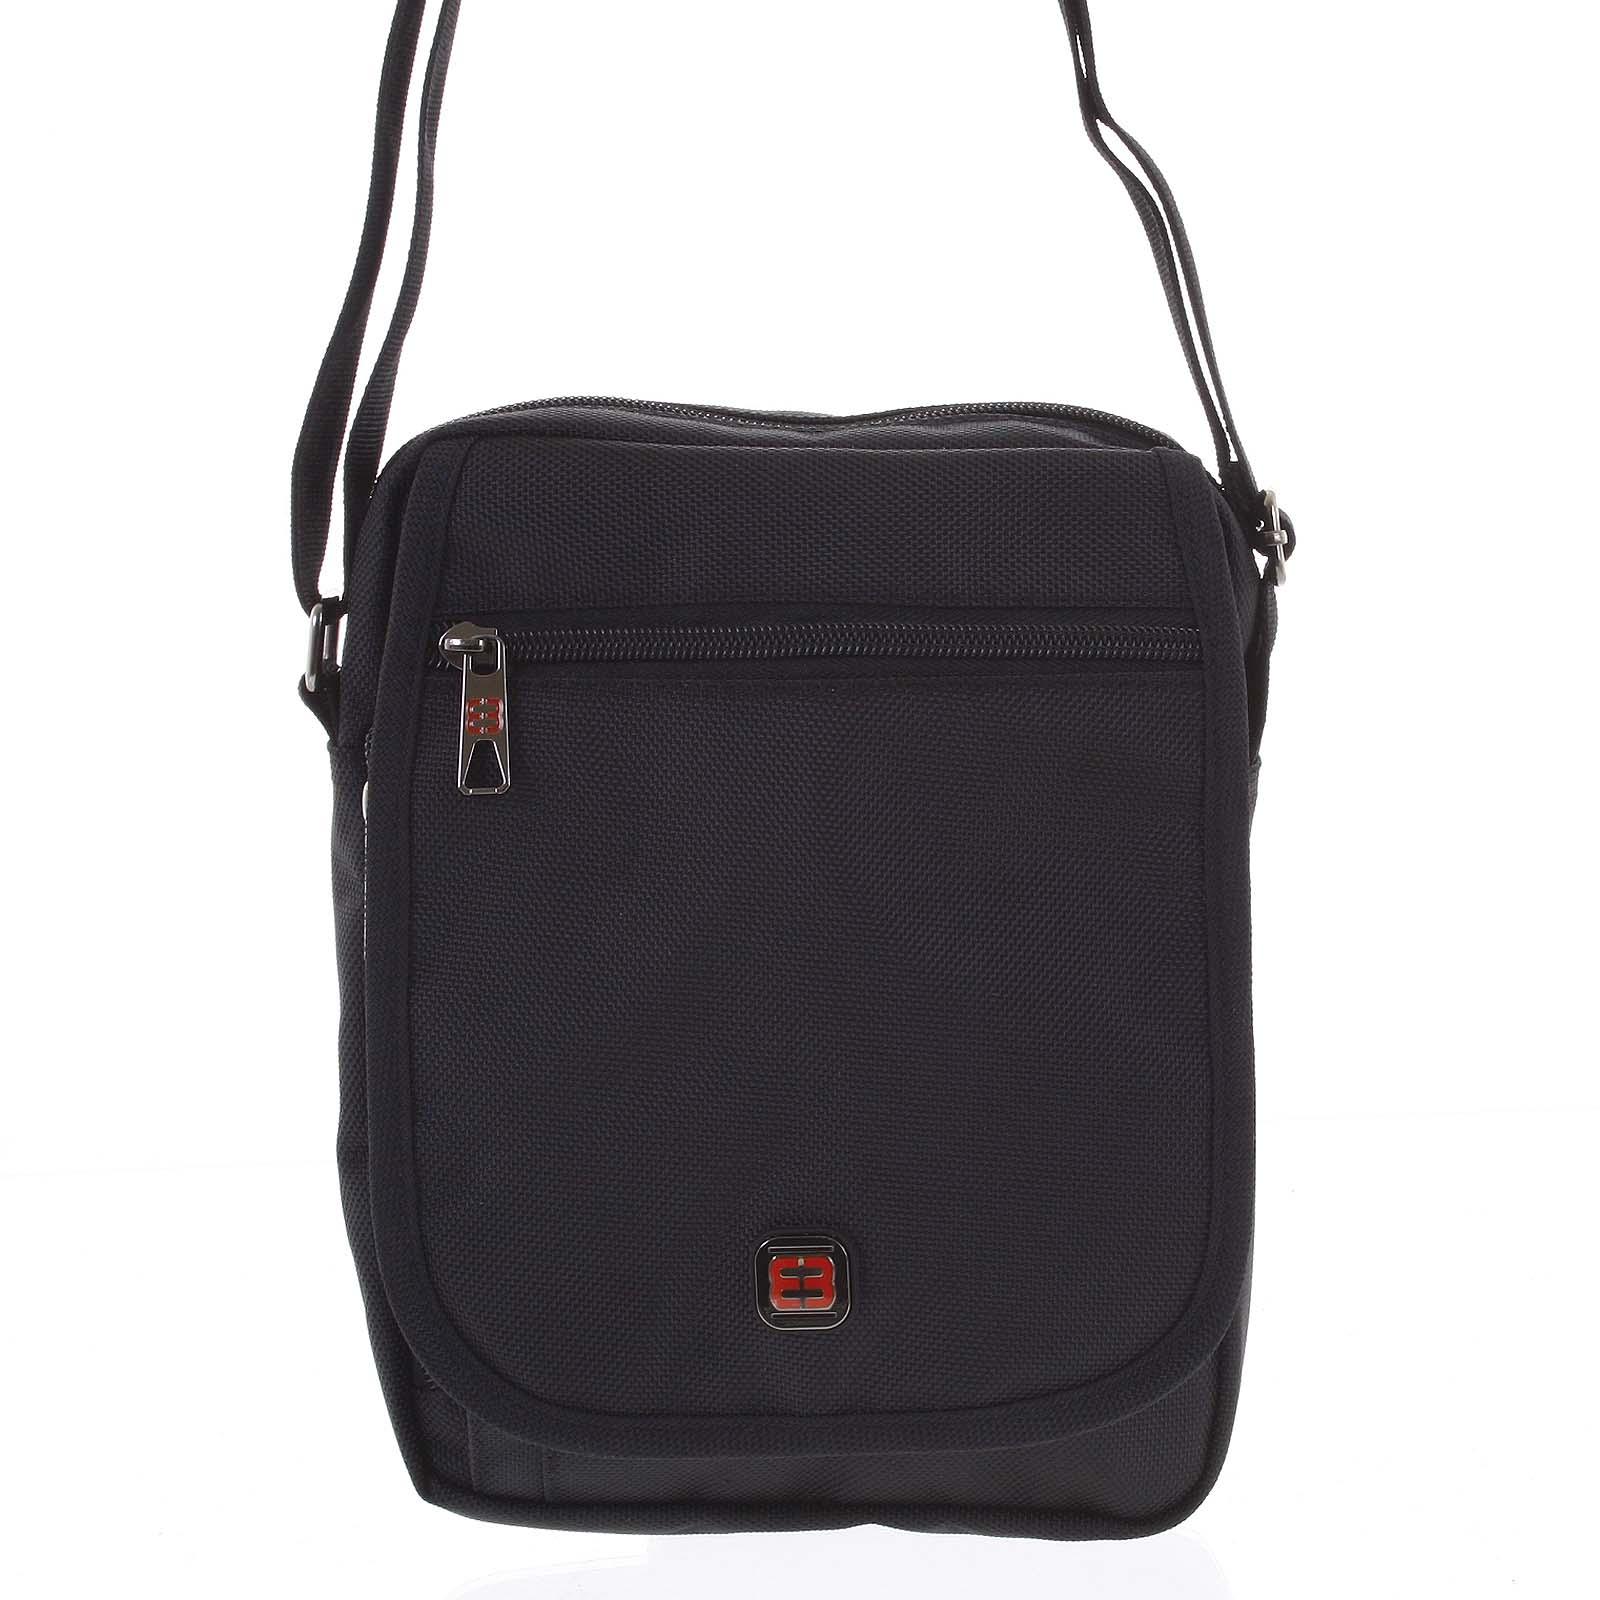 Pánská sportovní taška na doklady černá - Enrico Benetti Nico